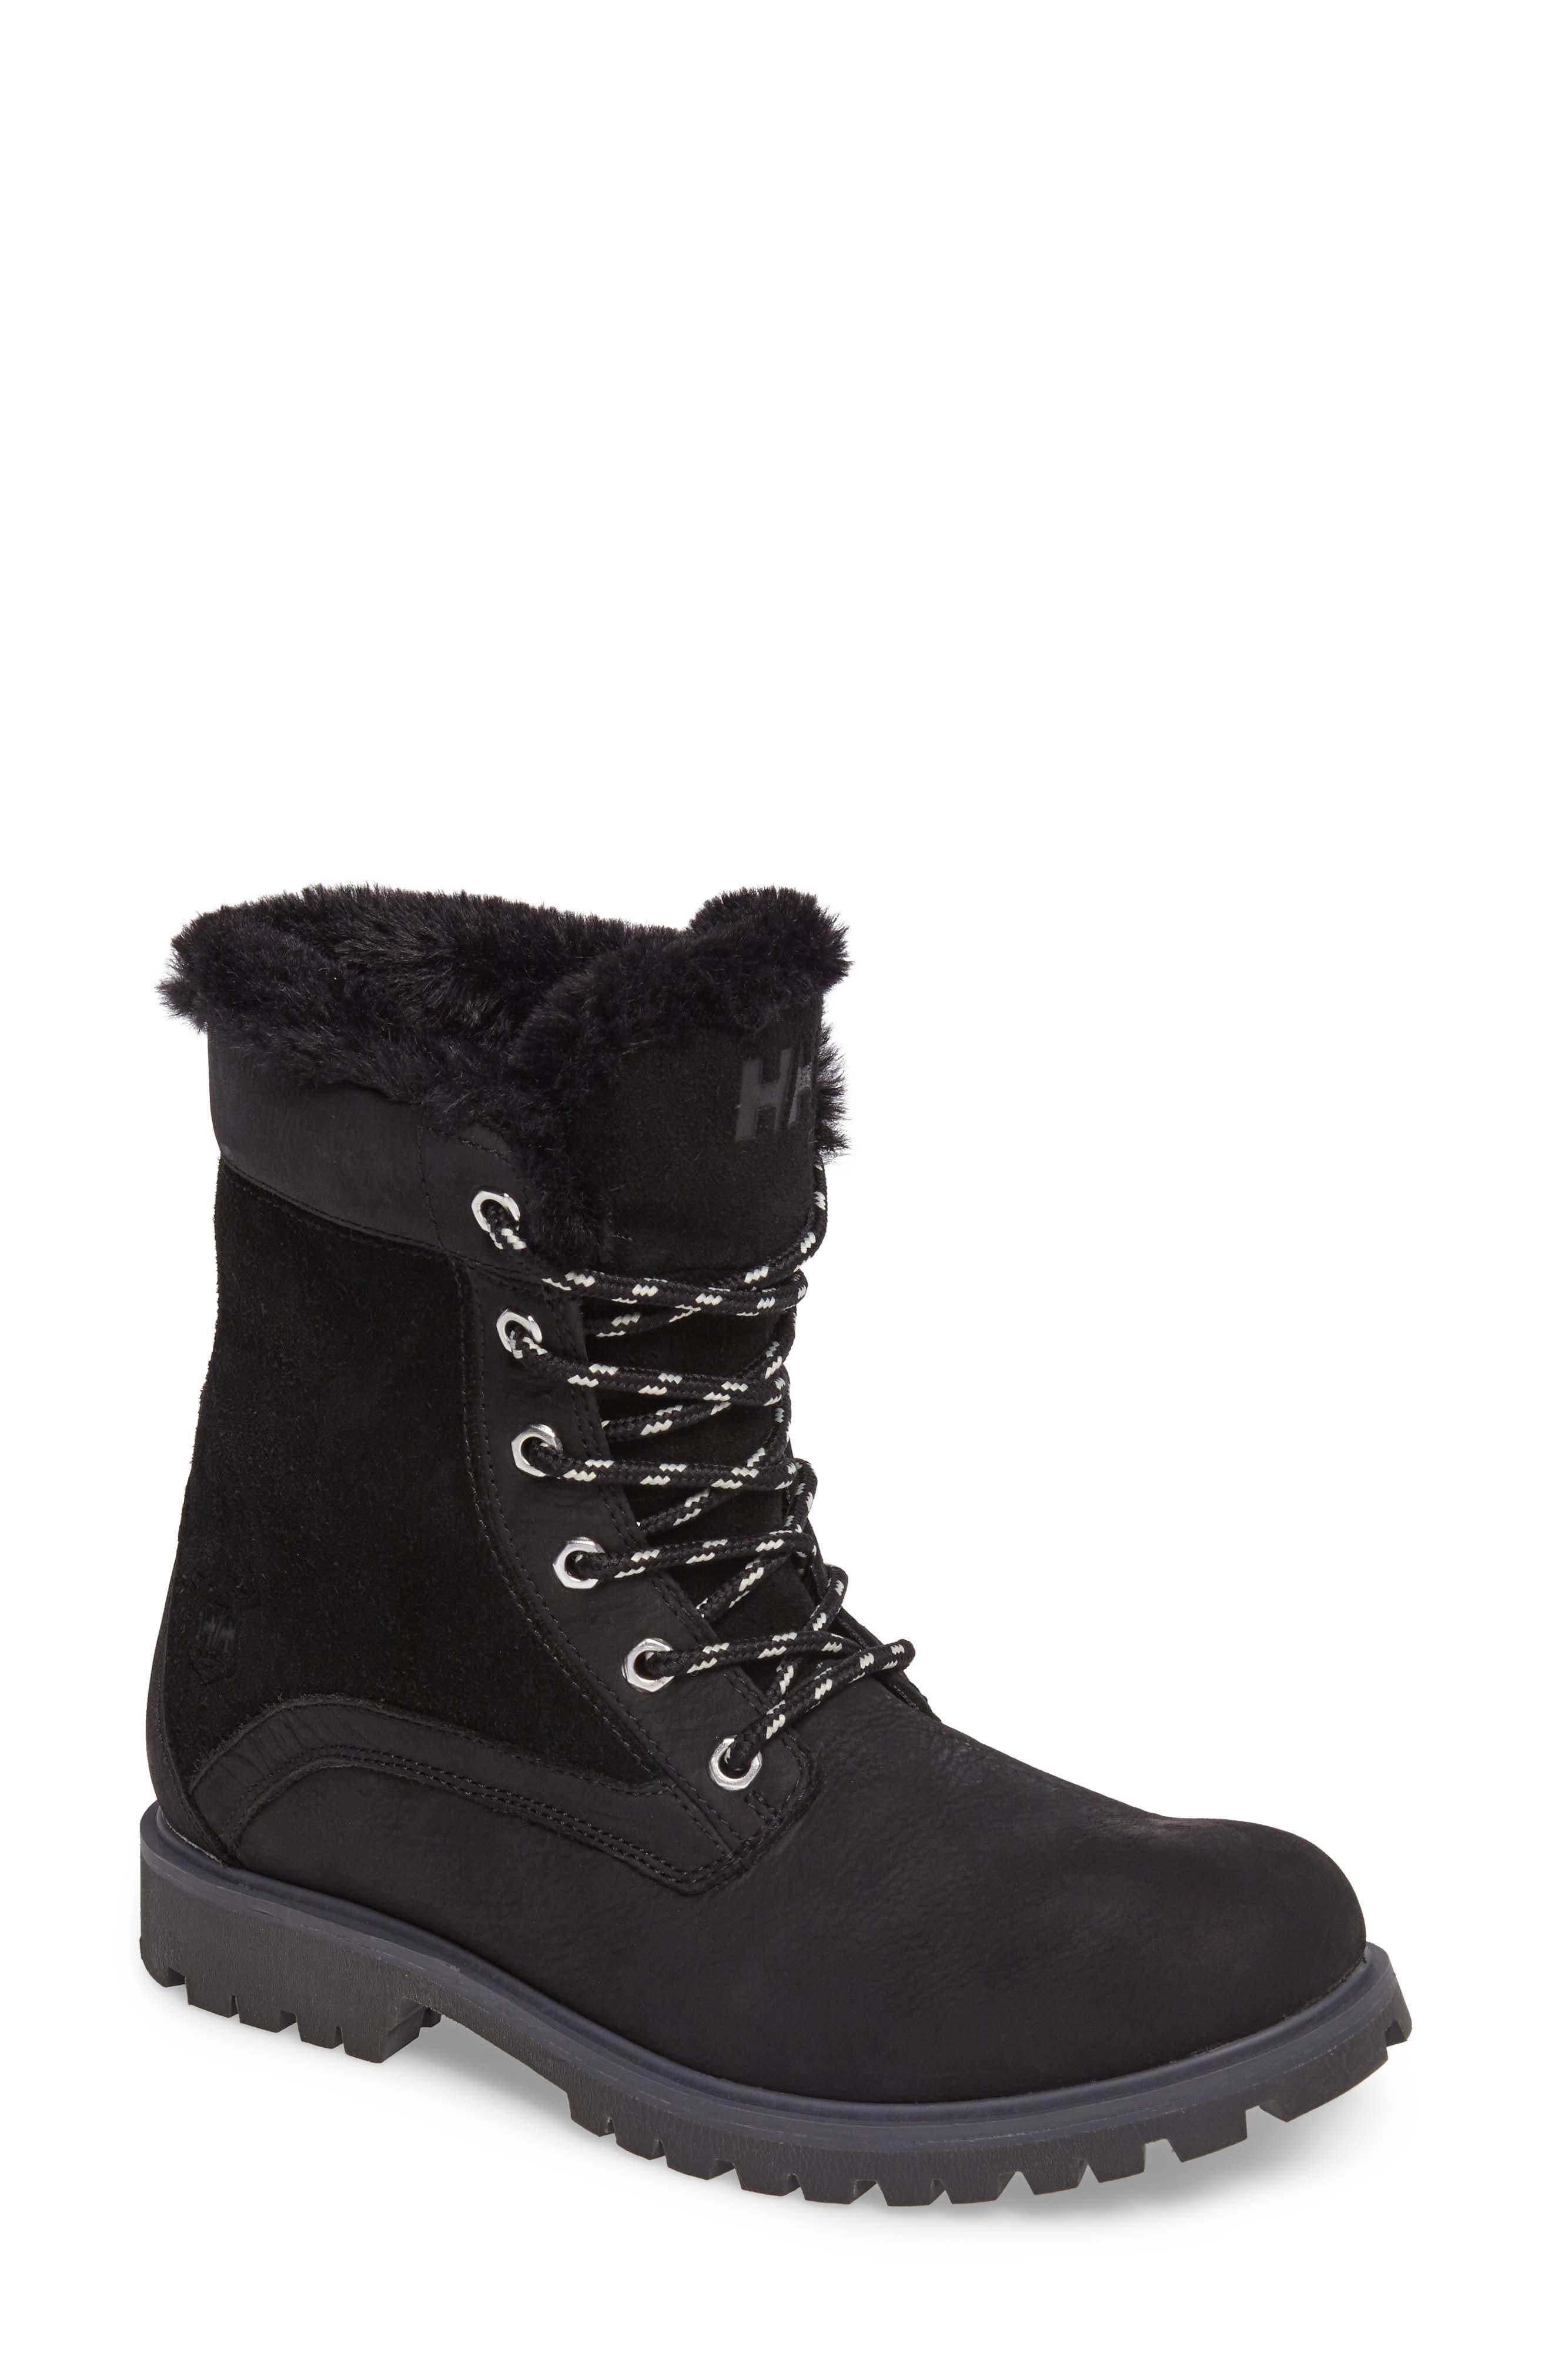 Marion Waterproof Winter Boot,                             Main thumbnail 1, color,                             Jet Black / Ebony / Black